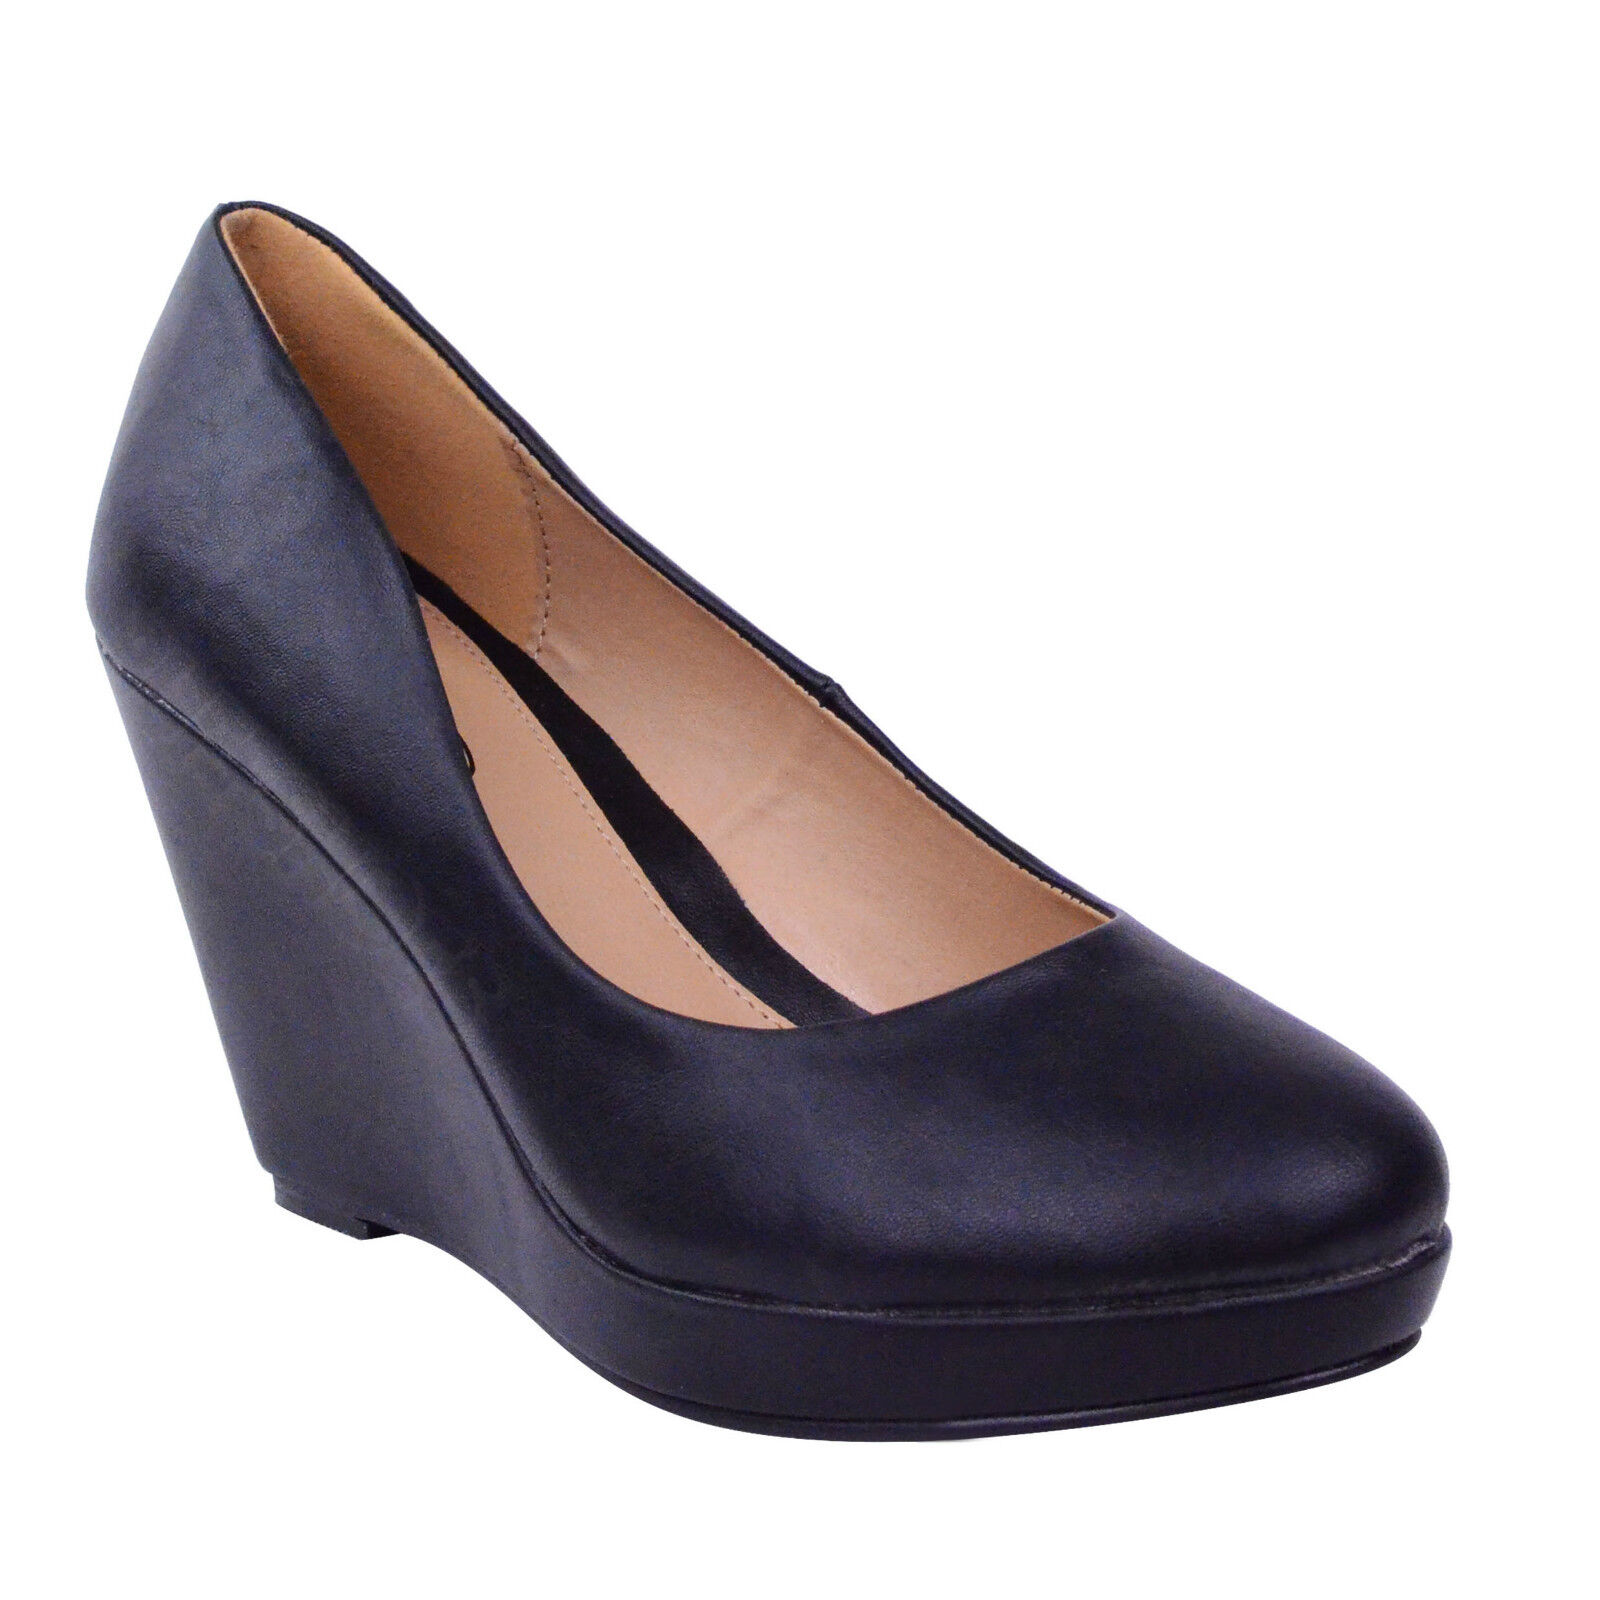 womens flat black shoes size 6 ebay